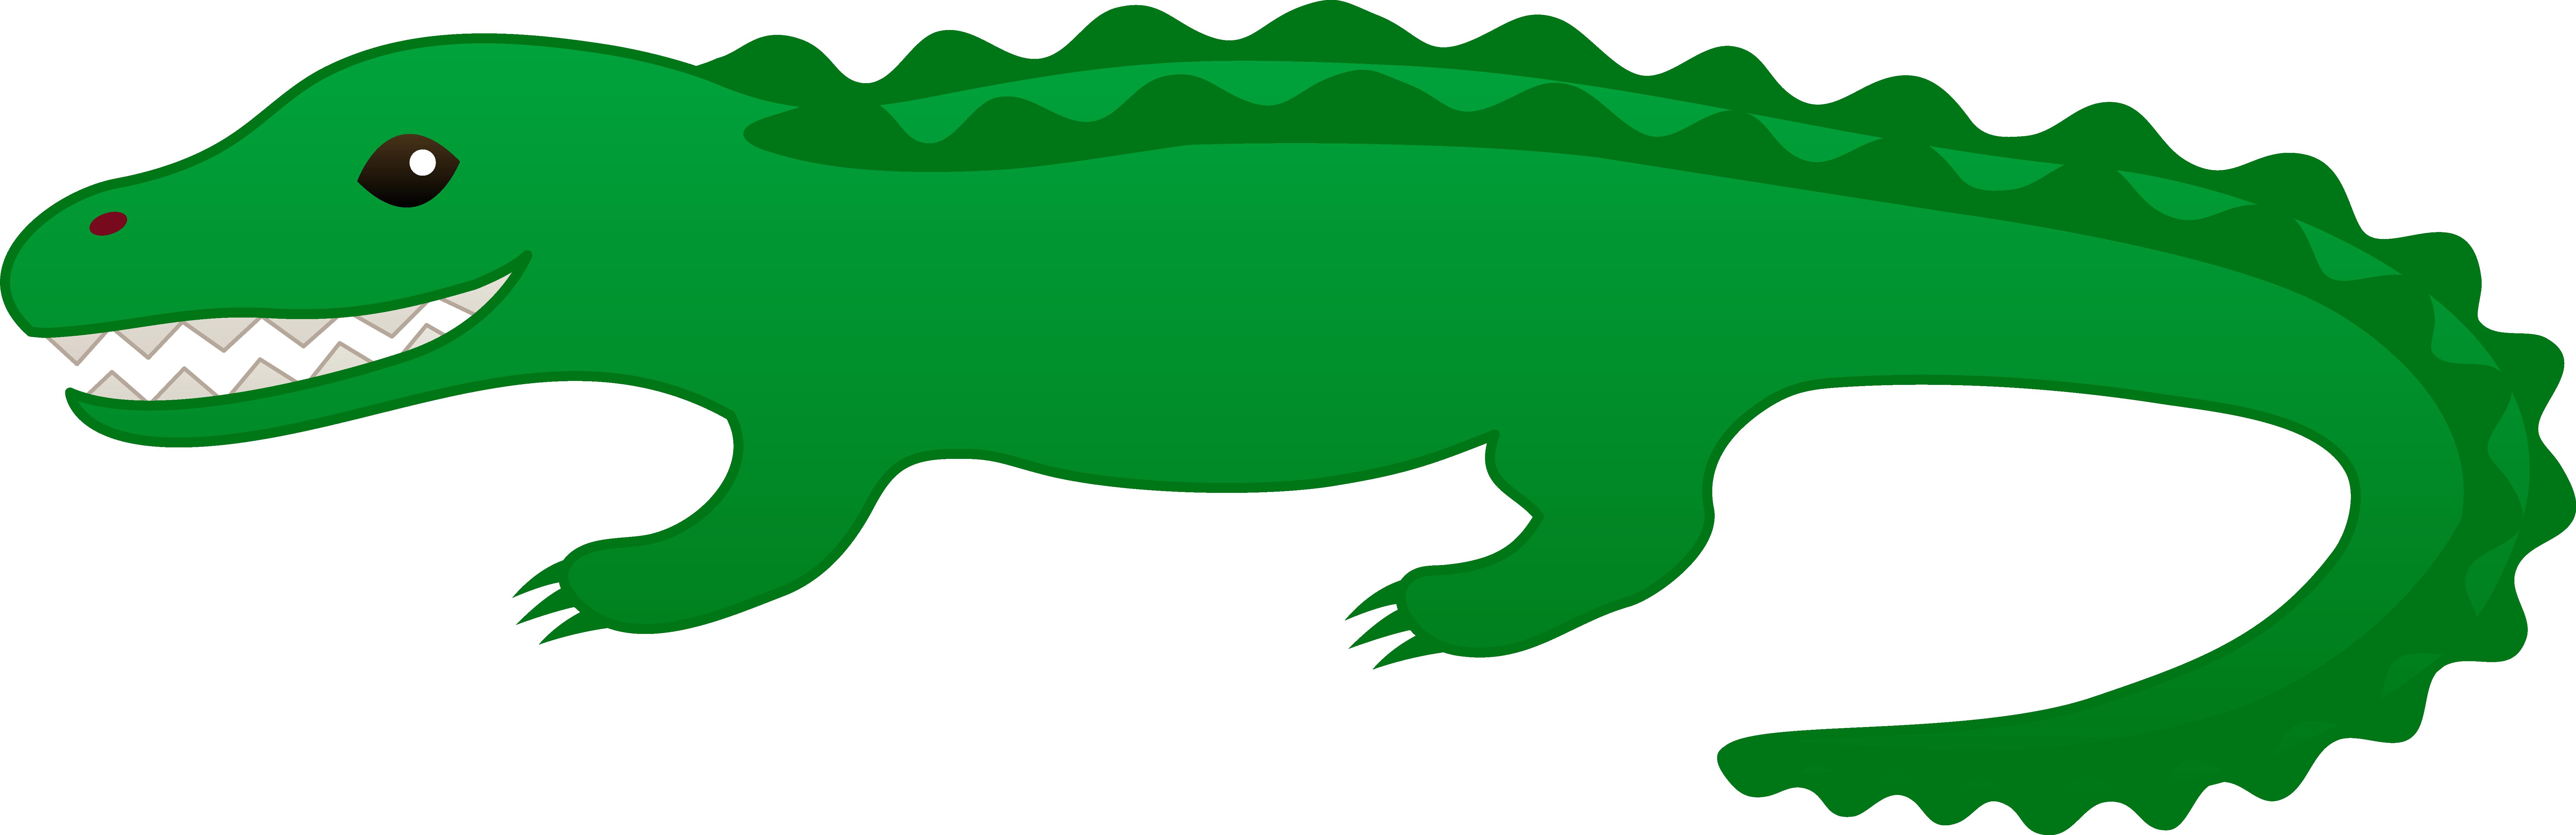 Nest clipart alligator. Green